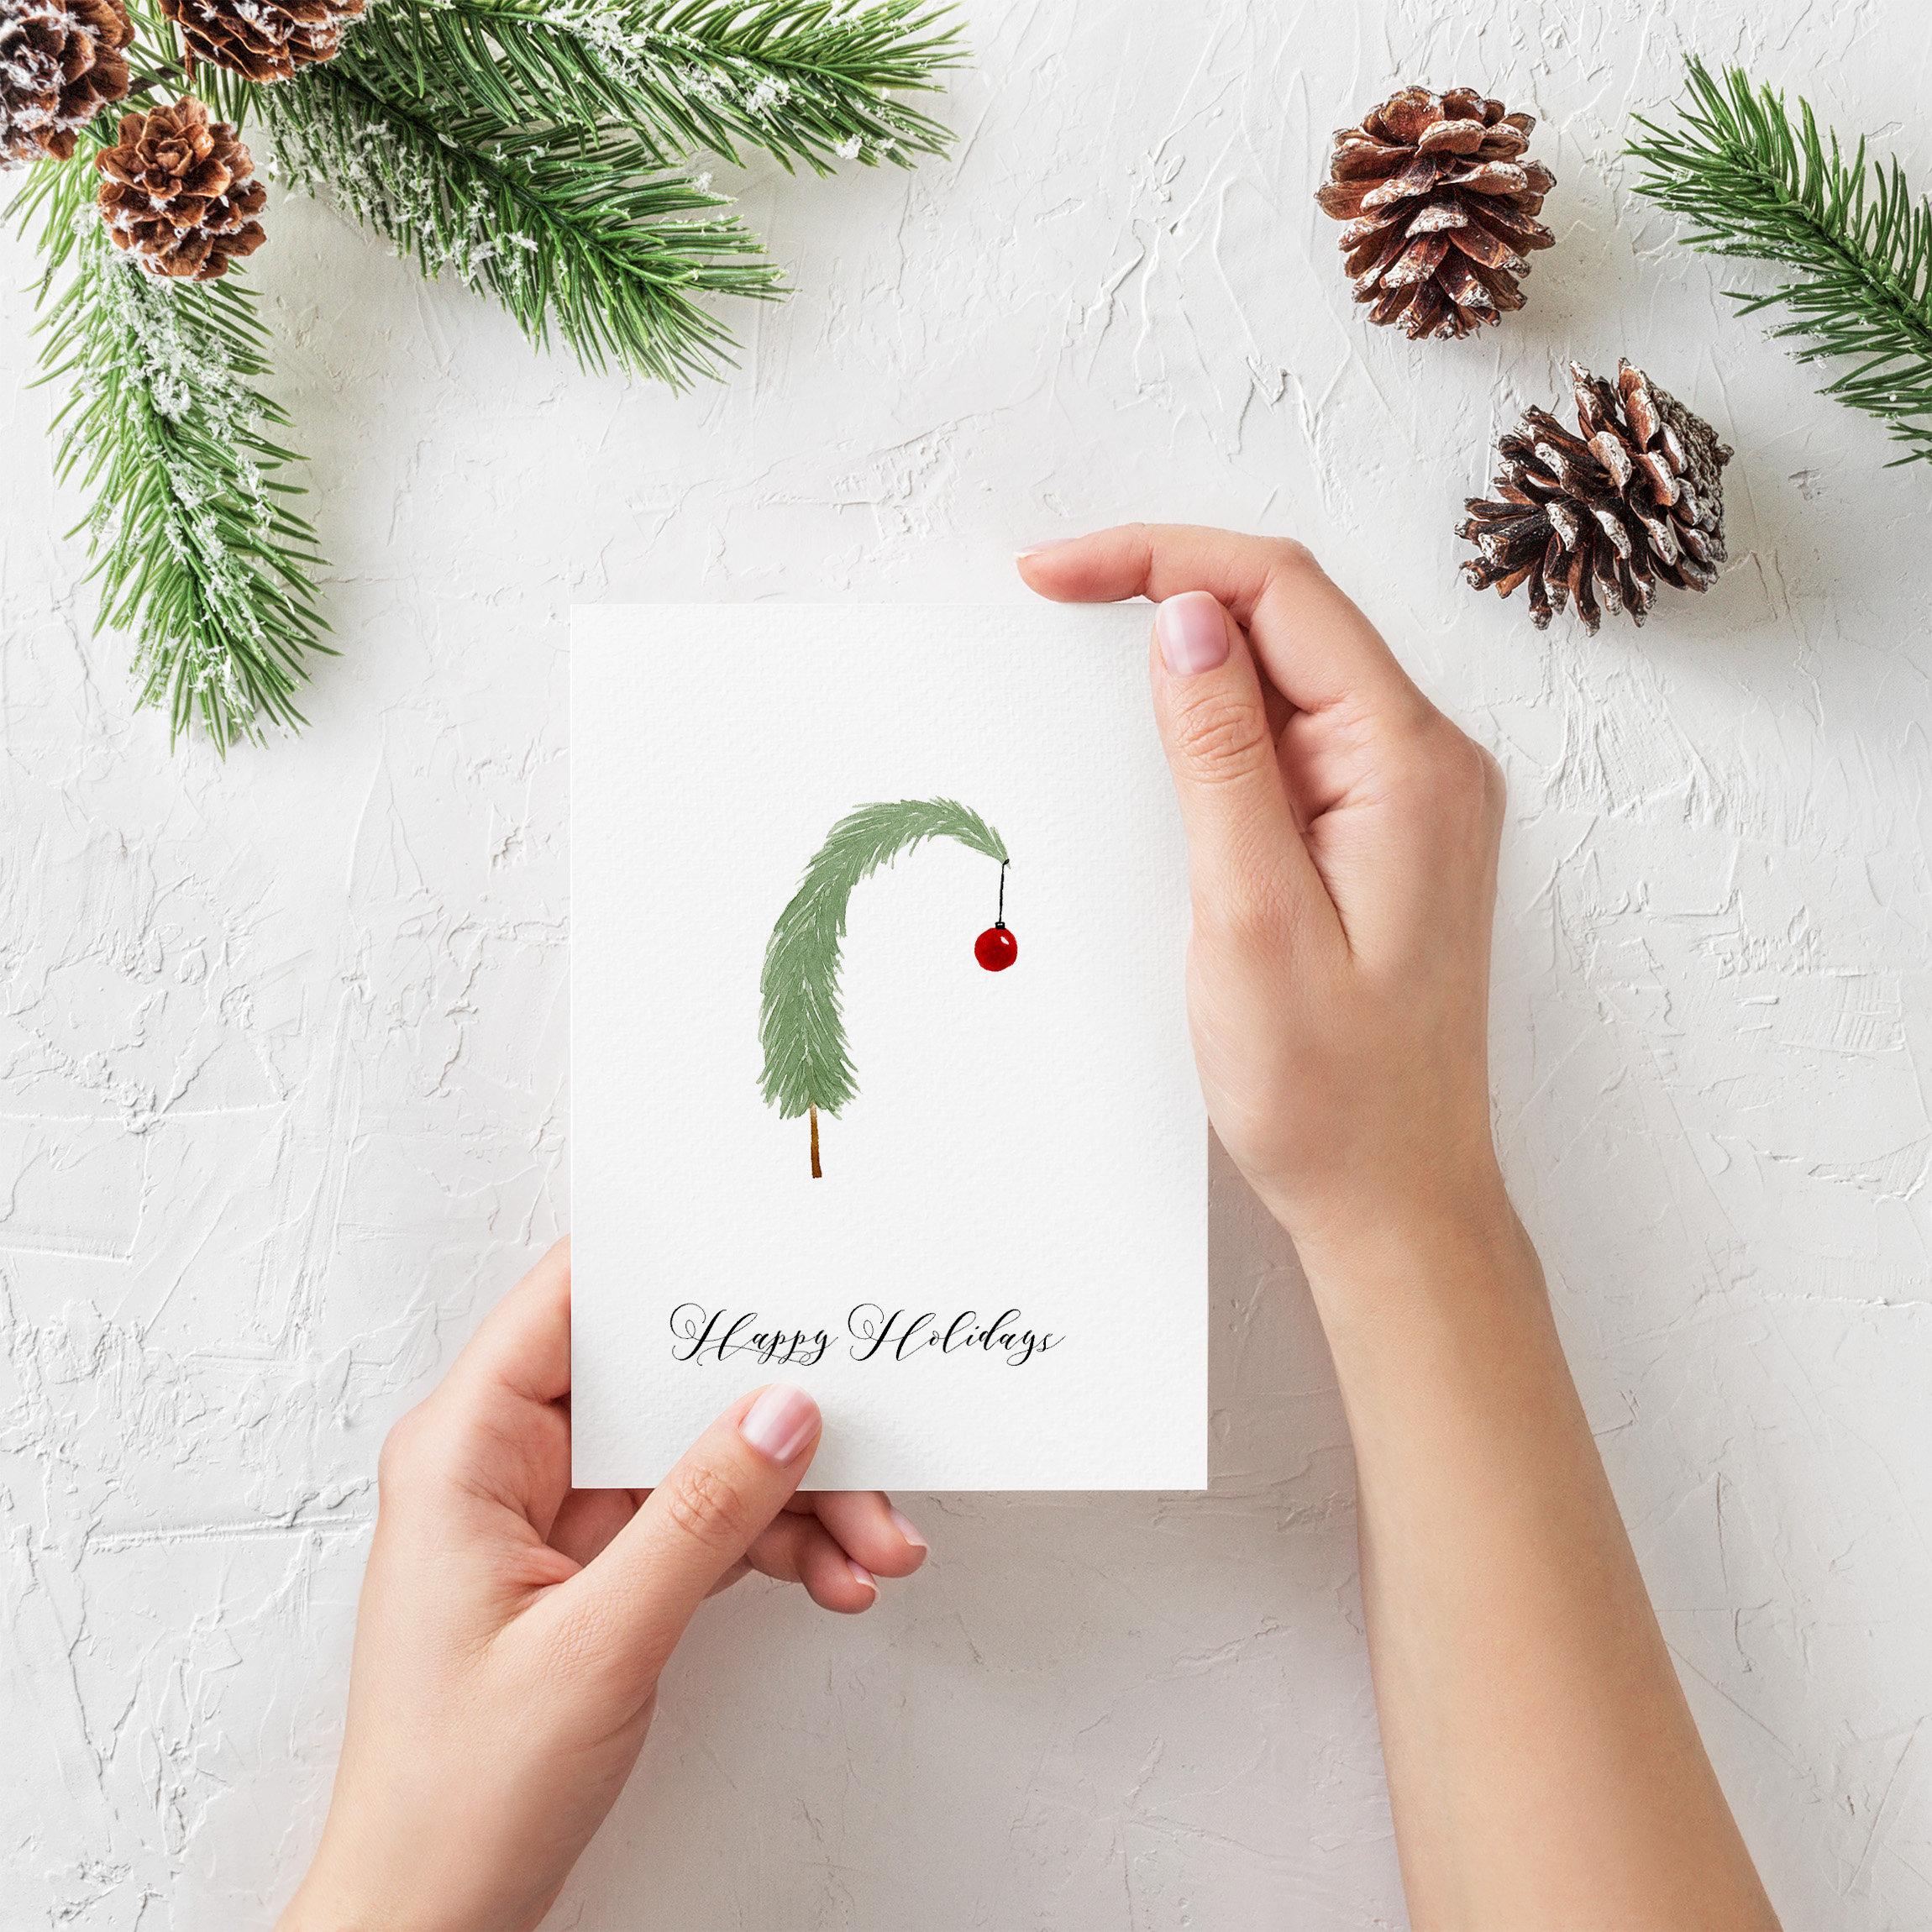 Handpainted Card Christmas Cards Handmade Christmas Tree   Etsy